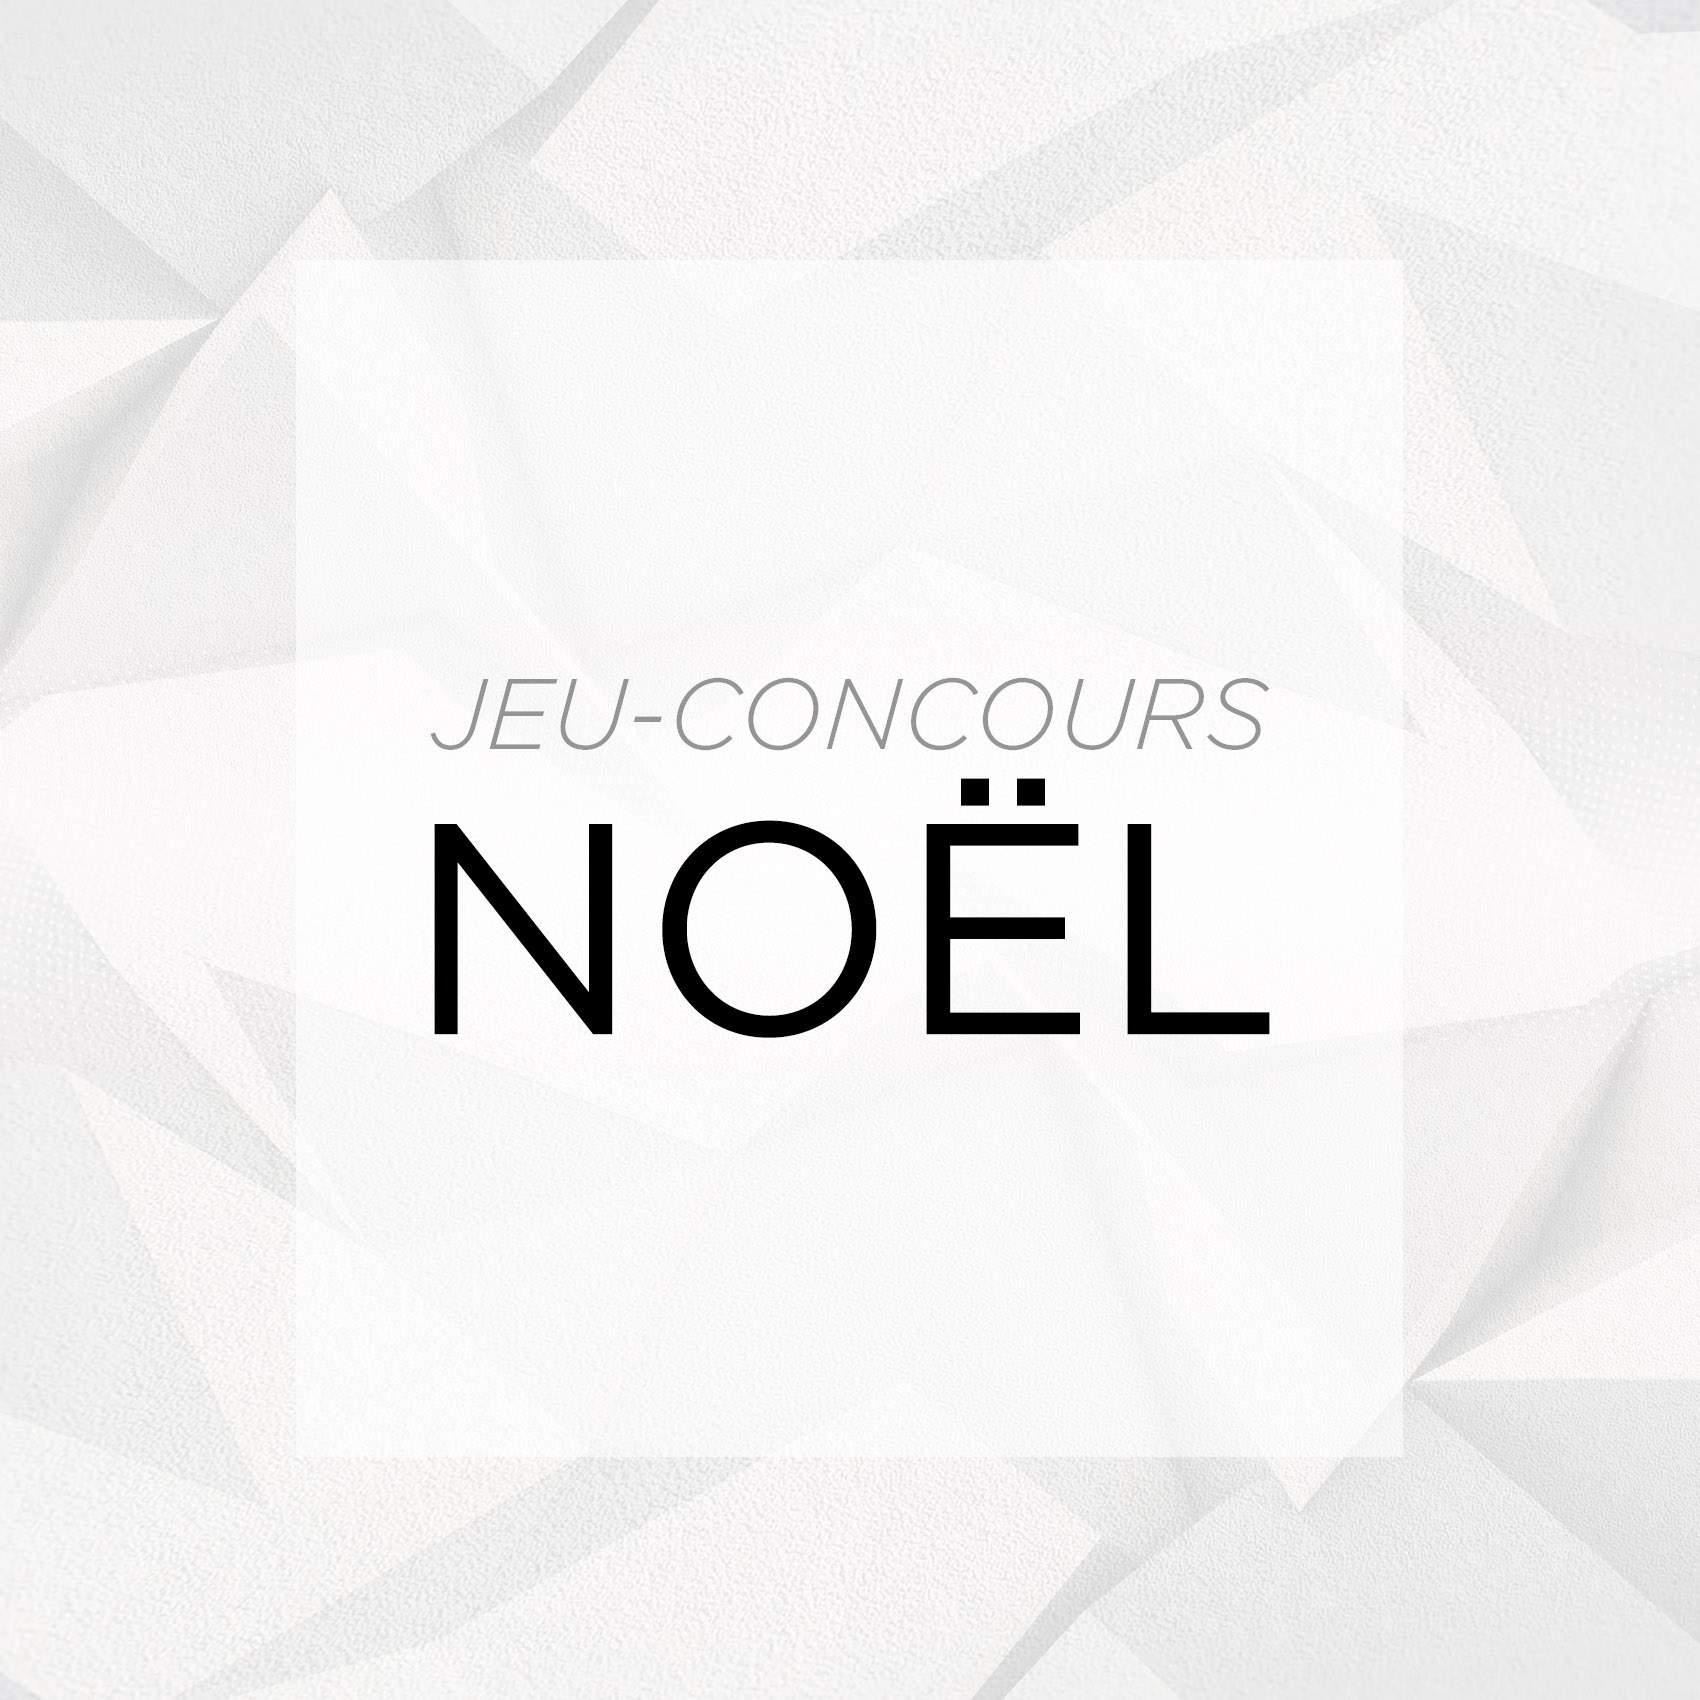 JEU-CONCOURS – NOËL 2015